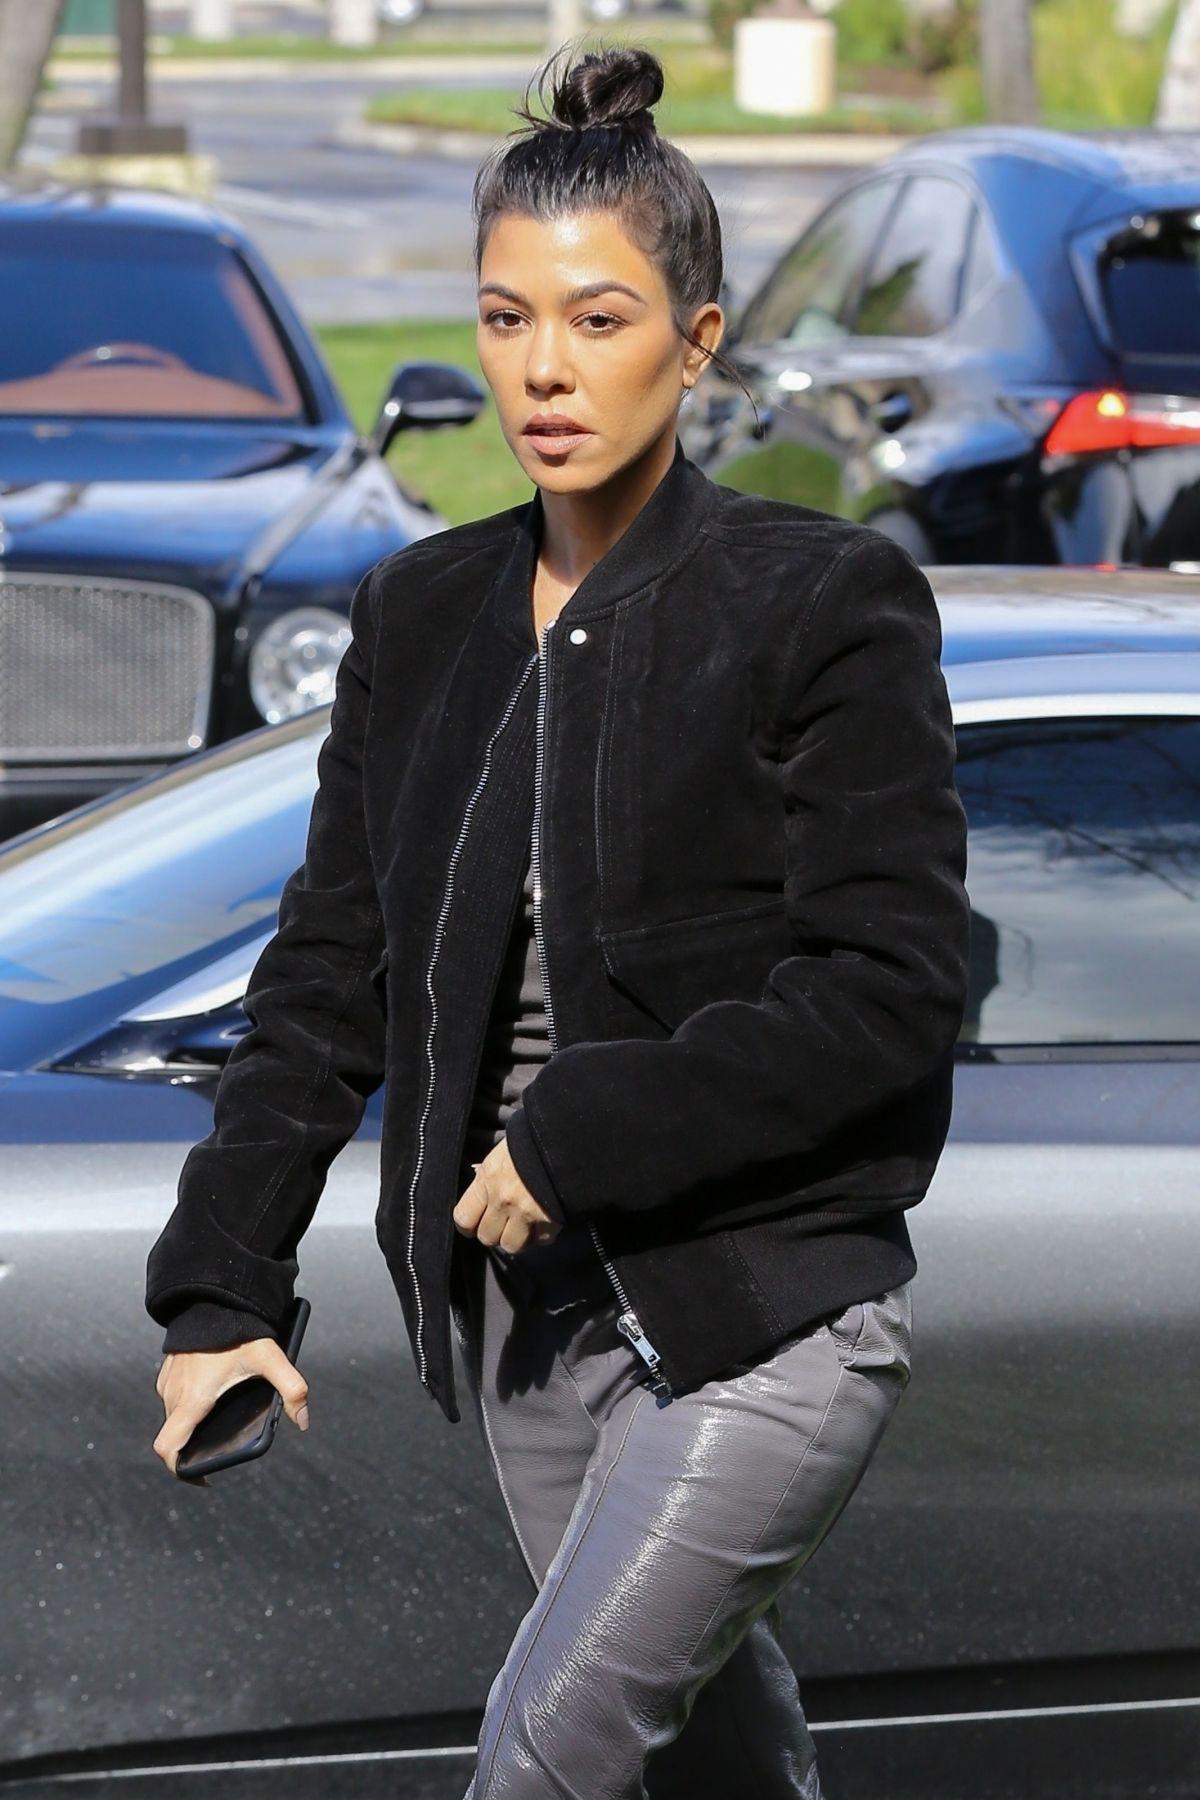 Image result for kourtney kardashian 2019